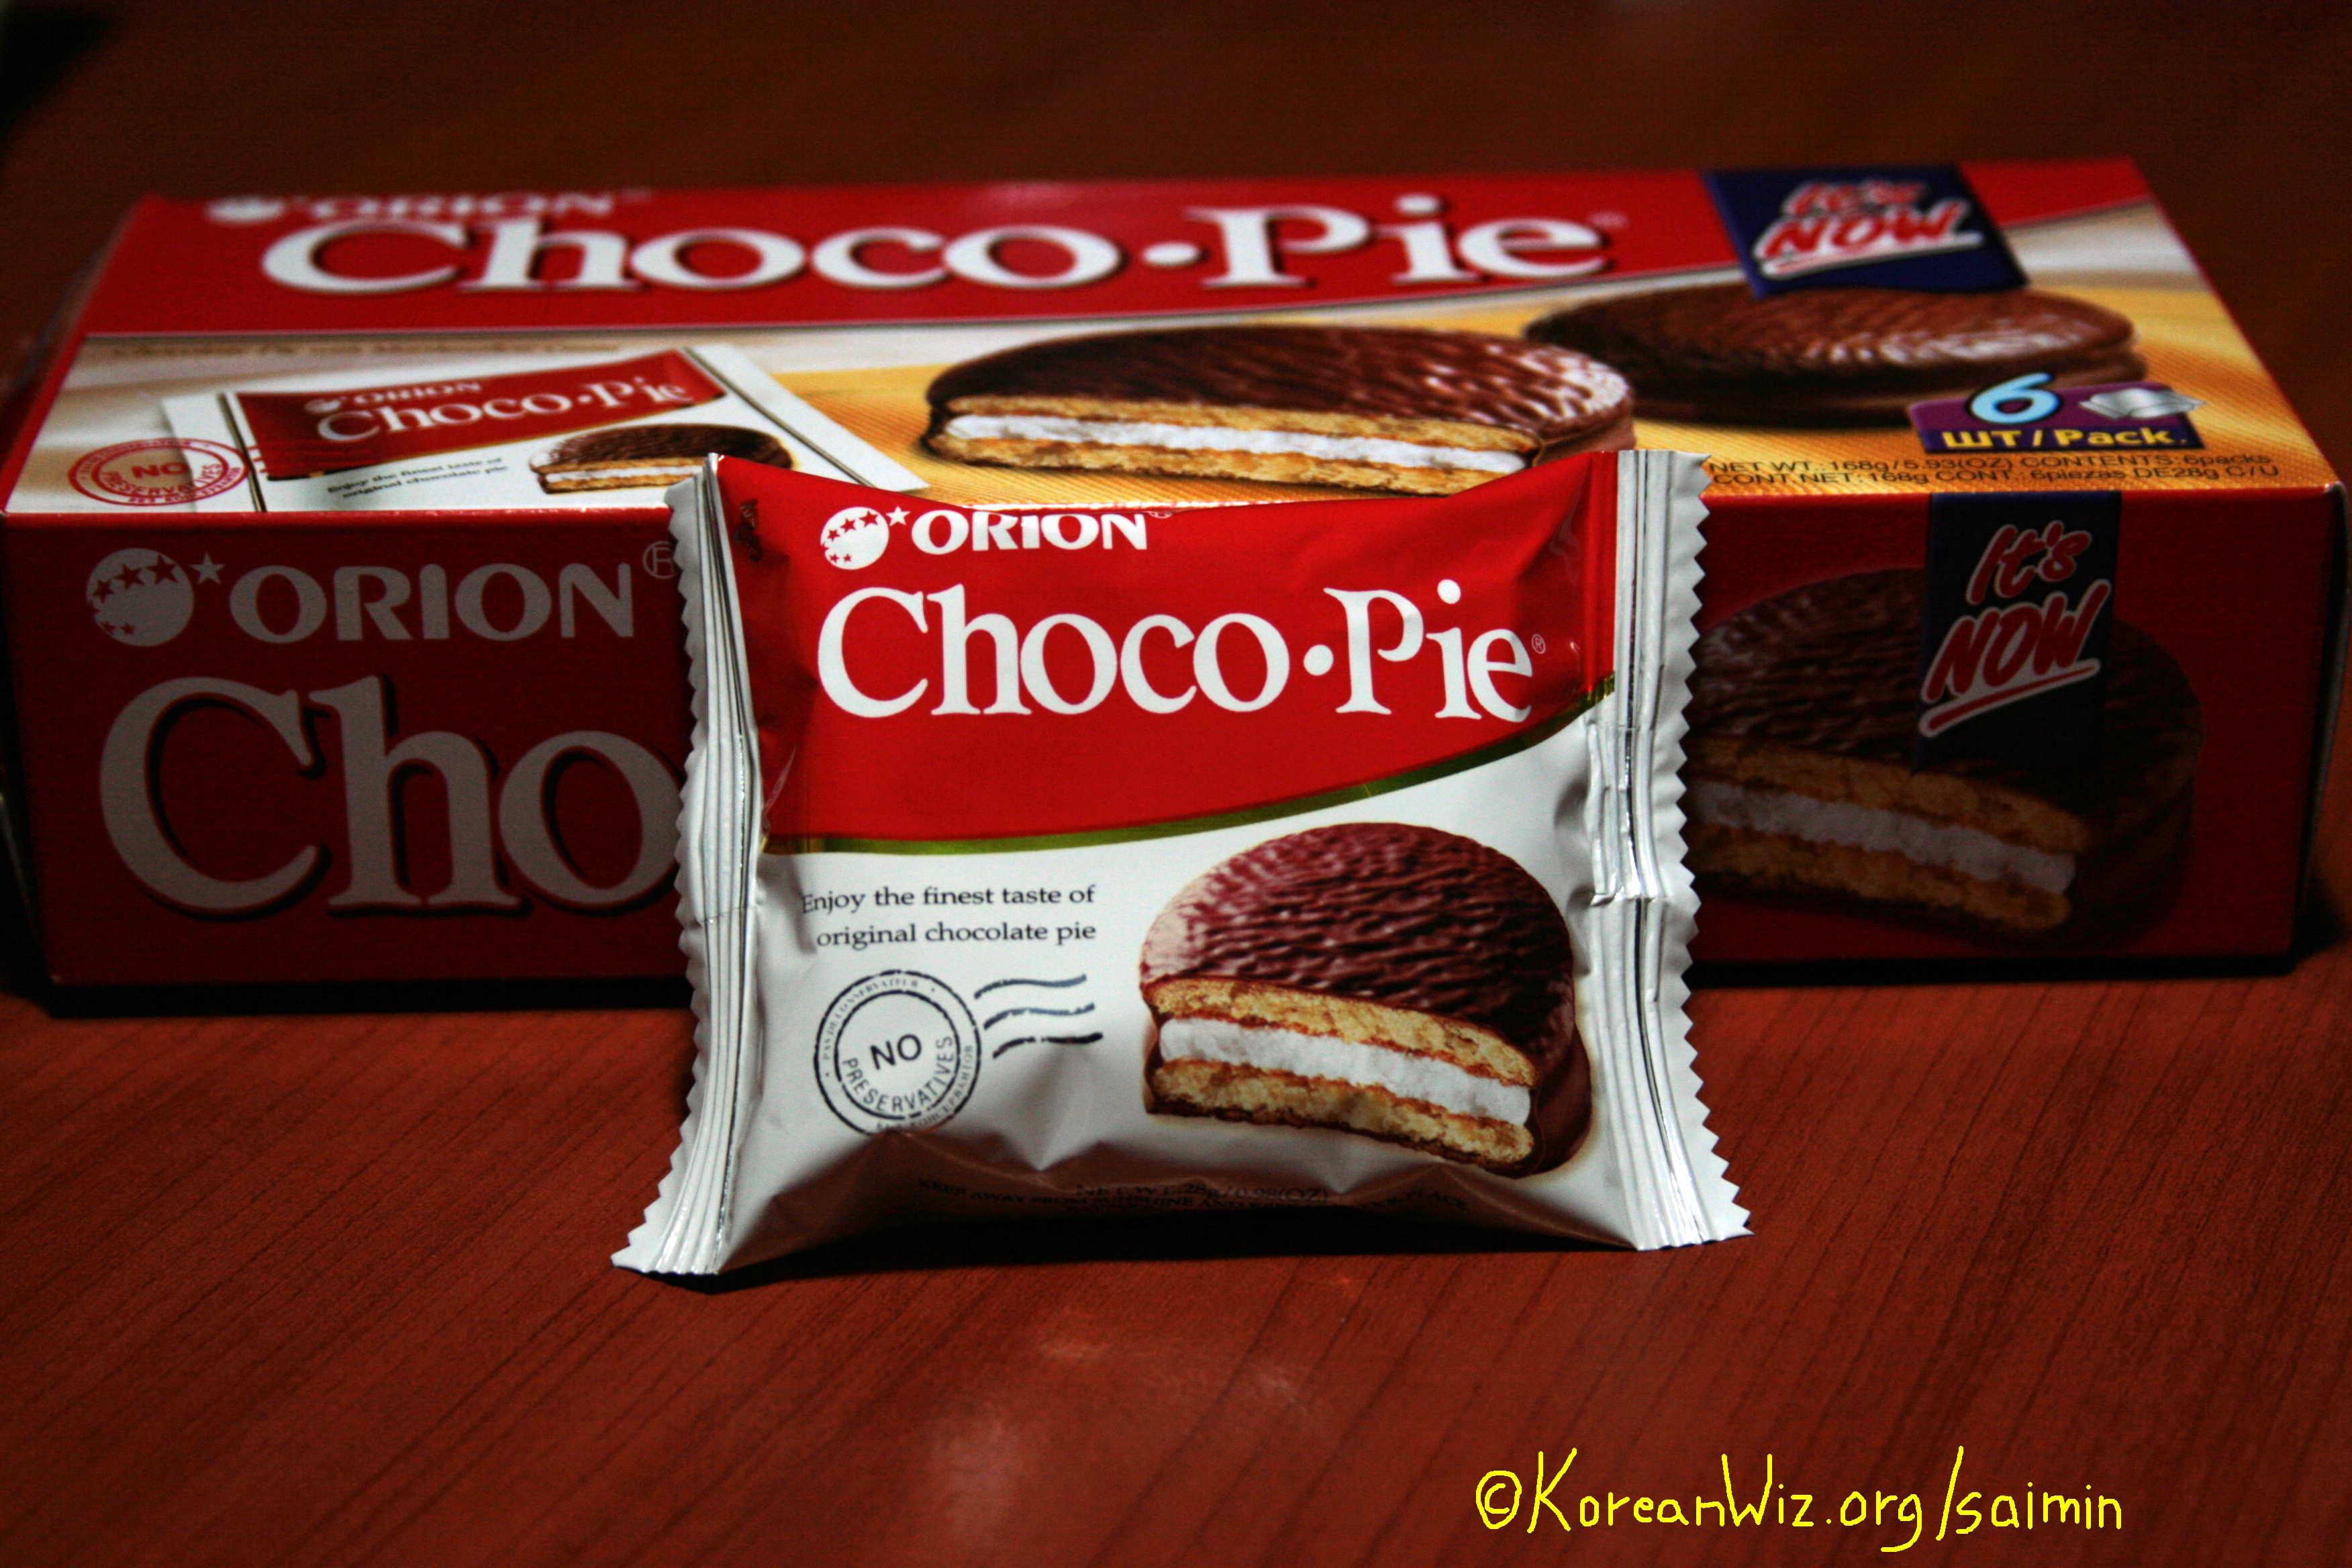 Orion S Choco Pies Exceeded 100 Billion Won In Global Sales In Q1 Businesskorea